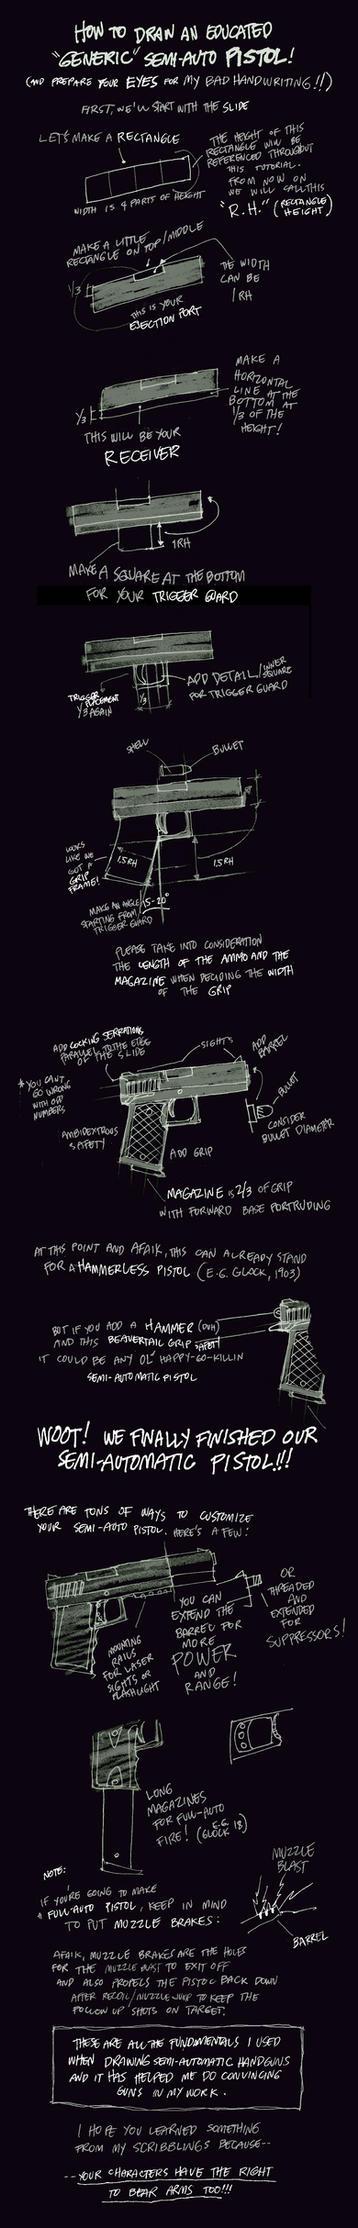 How to Draw a Semi-Auto Pistol by scruffyronin